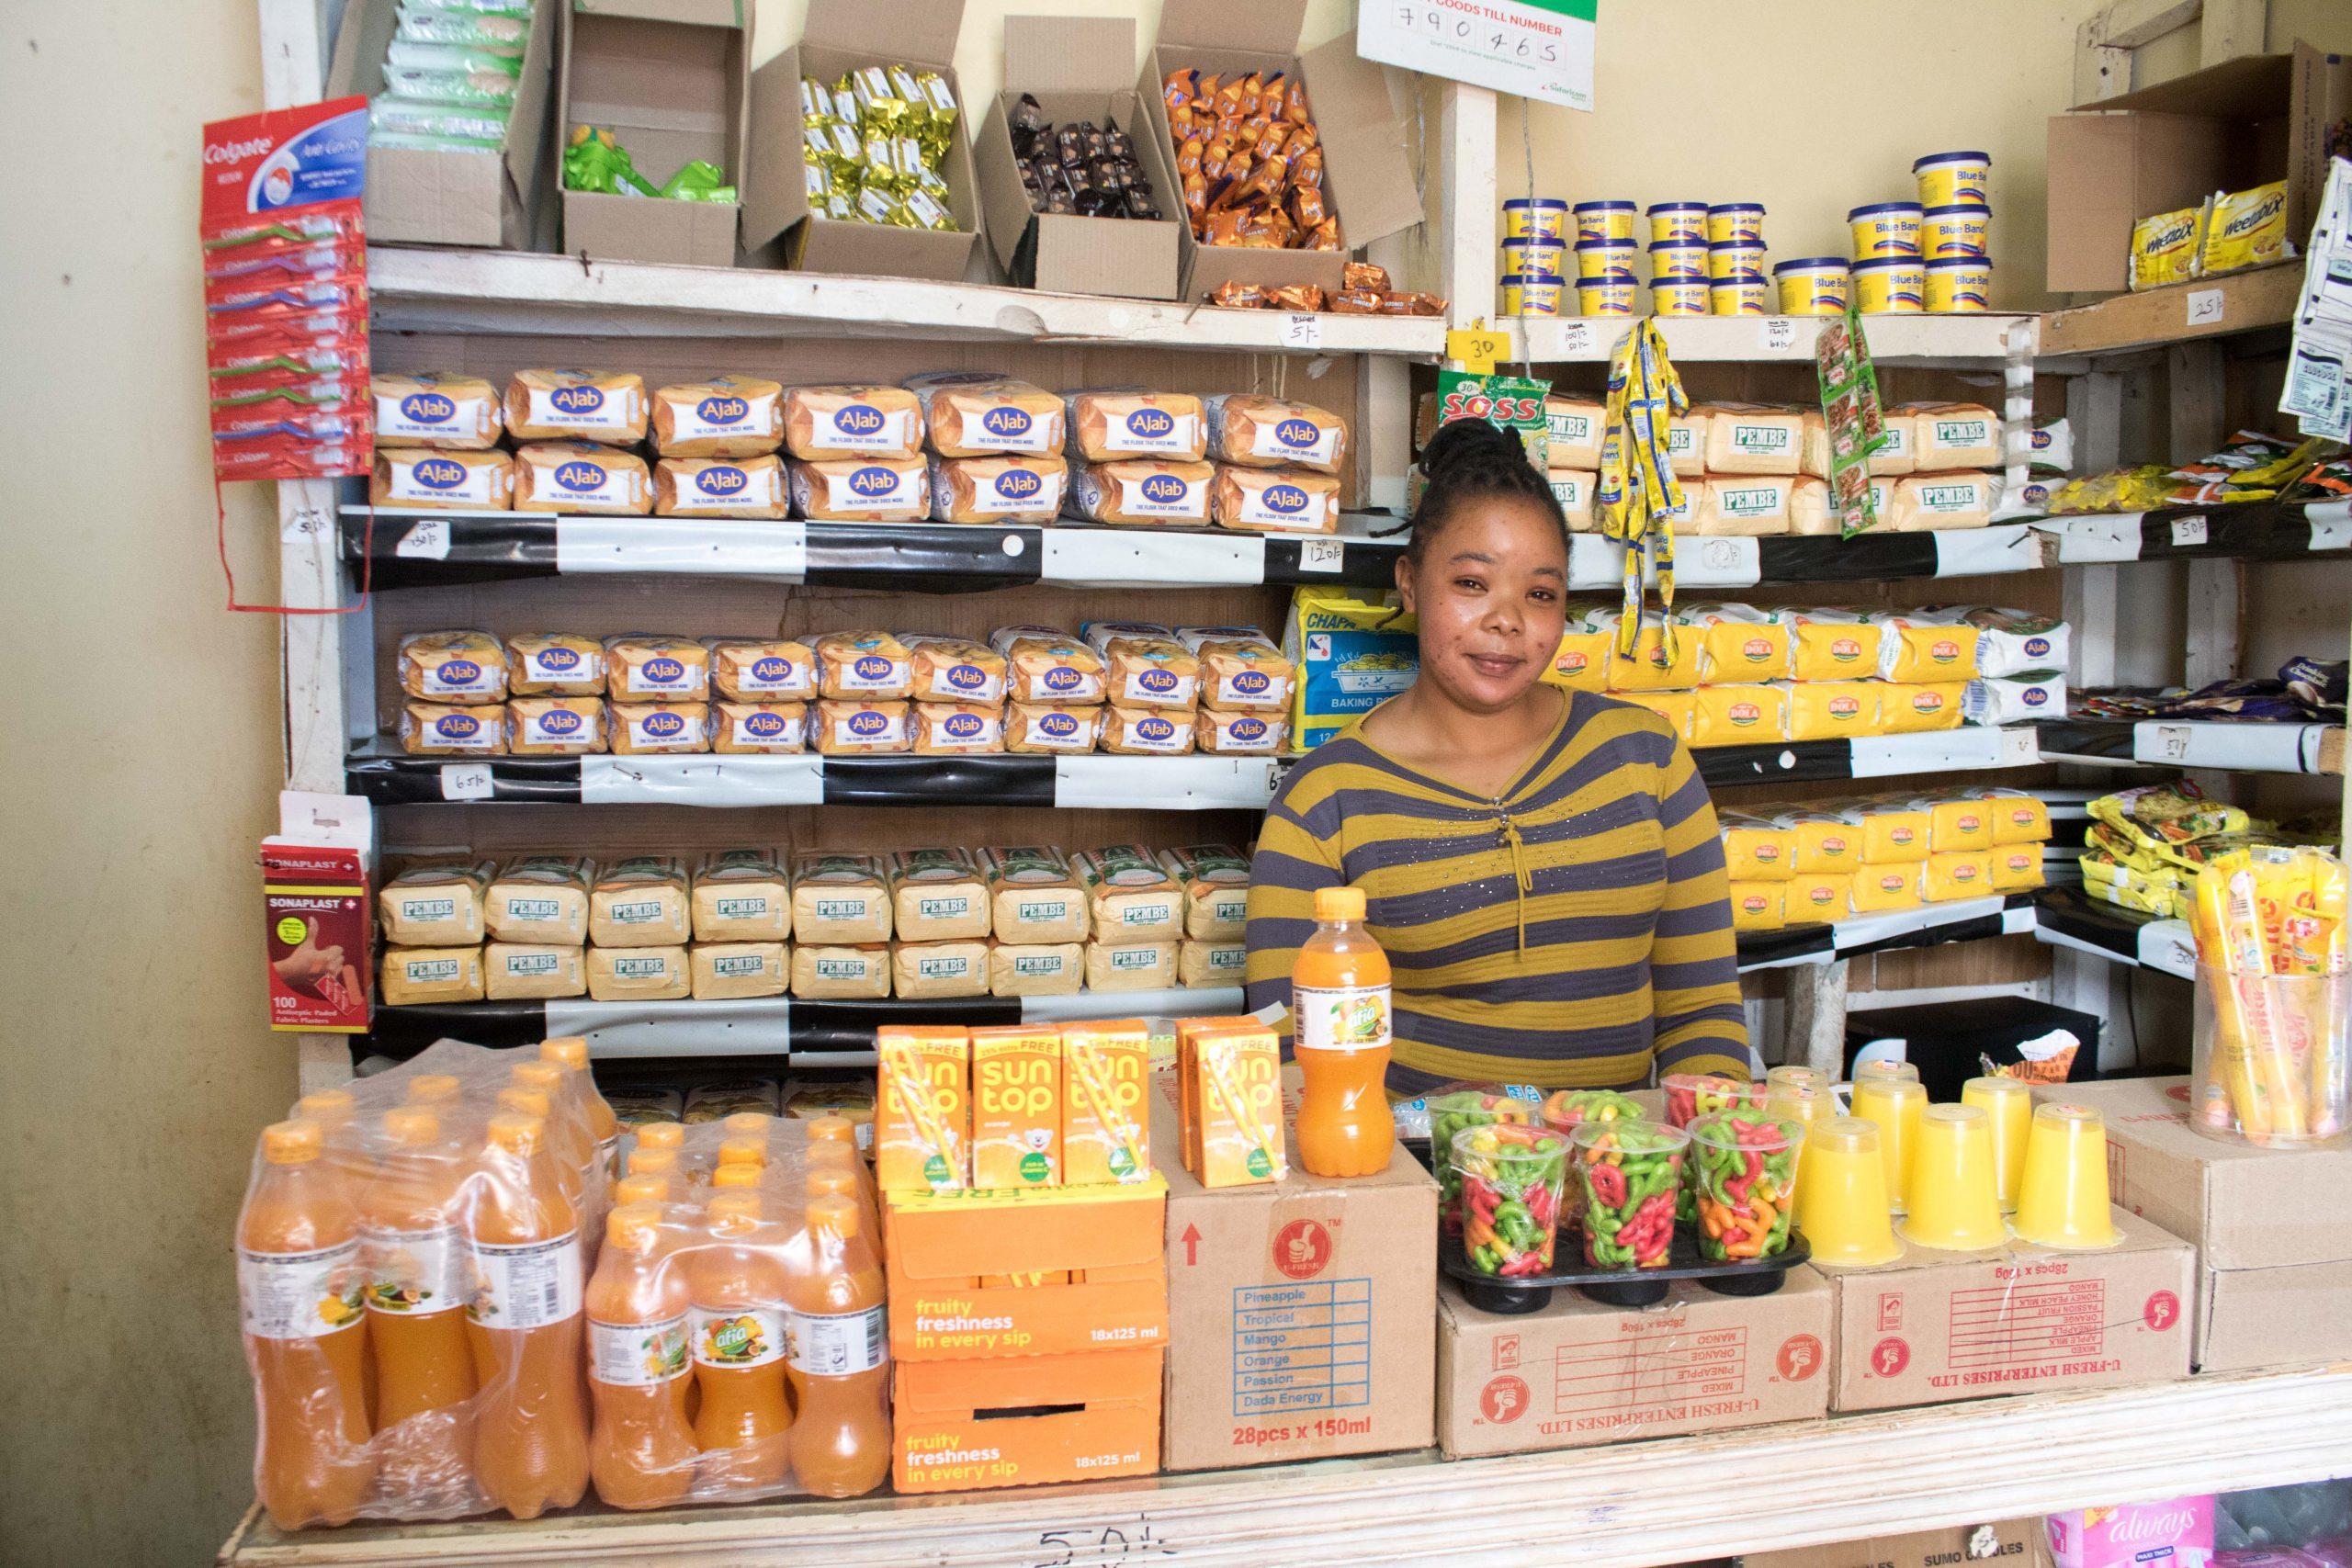 Micro-retailers like Jacinta Musyoka gain access to finance and technical support through the mSPARK program.